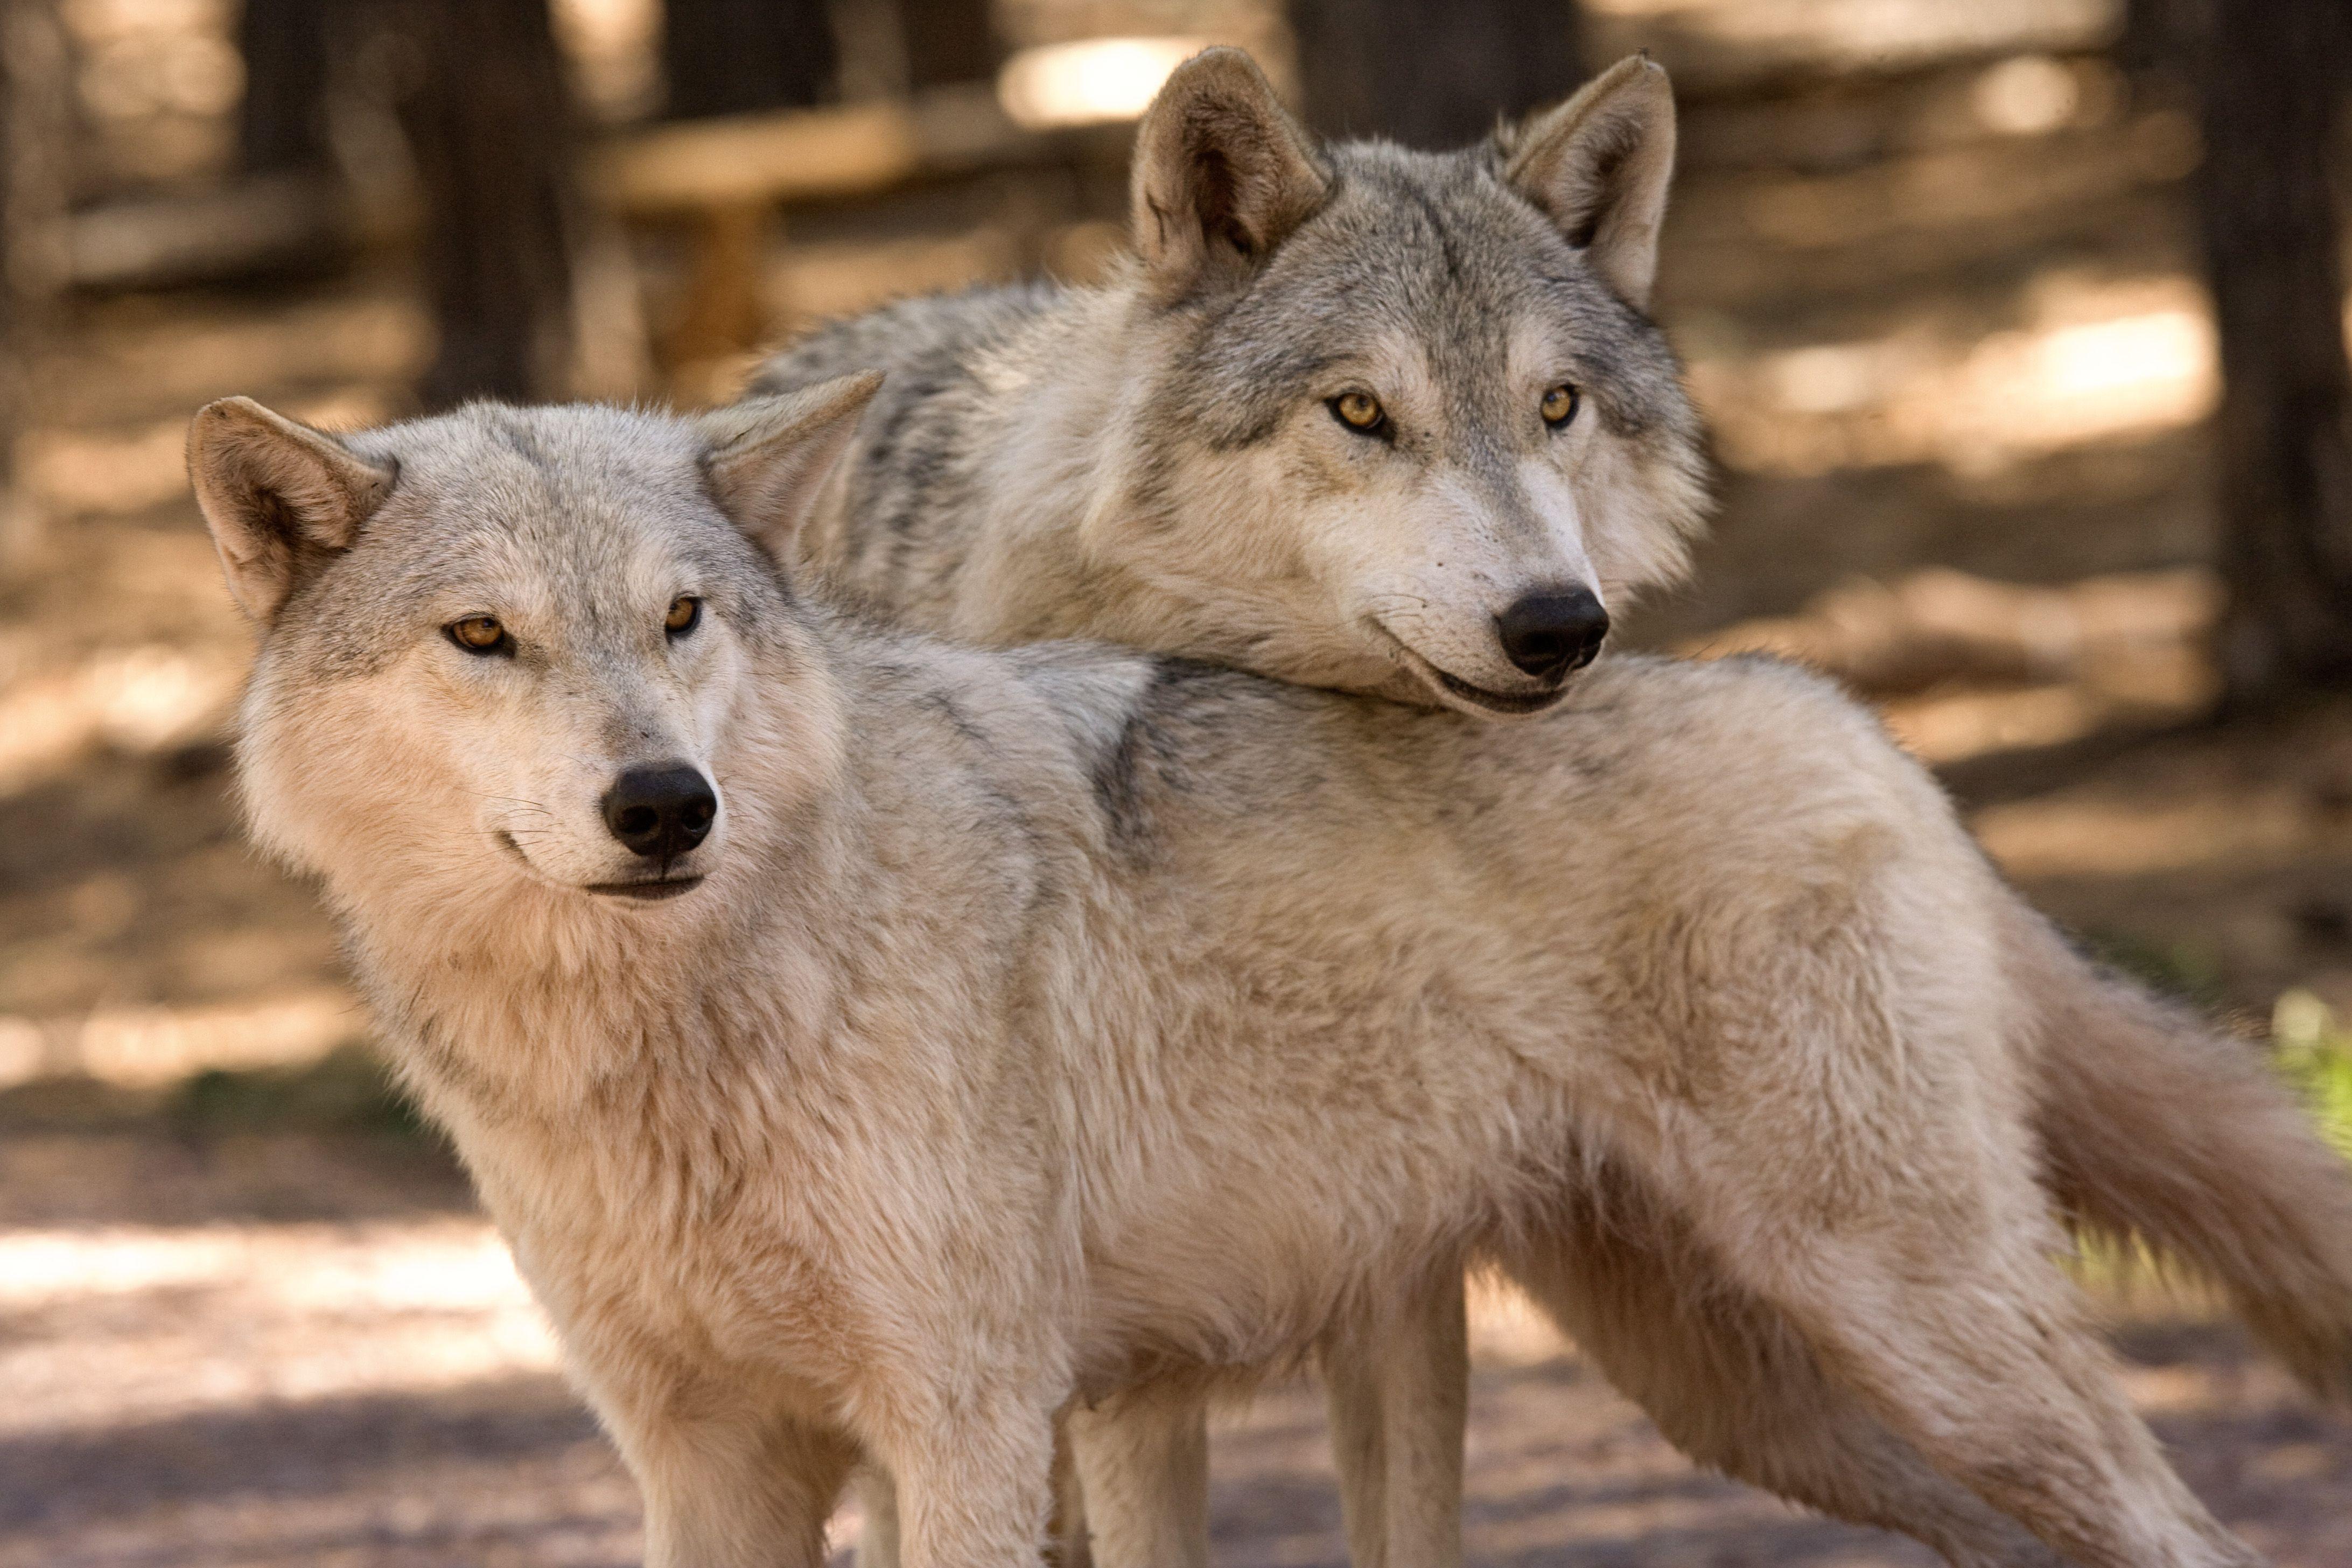 Bearizona Wildlife park drive, 3 hours from Phoenix, 20